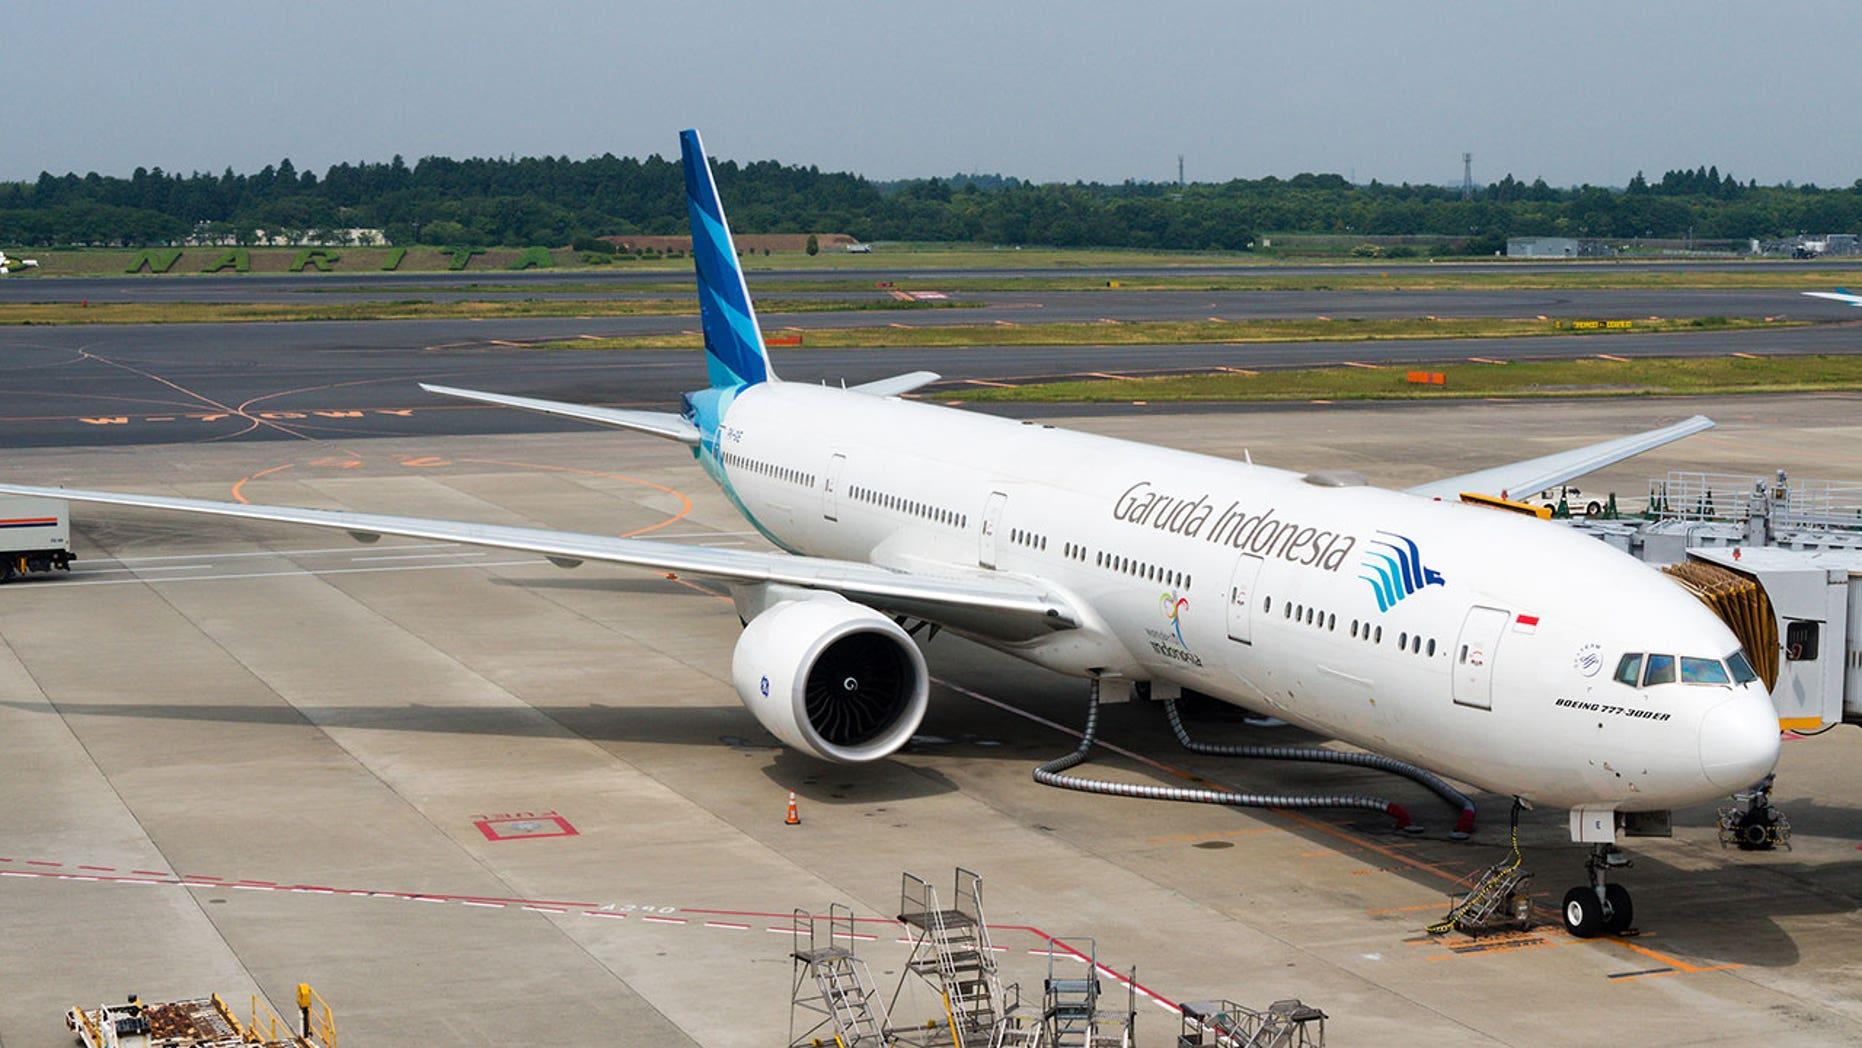 Travel blogger Sam Huang scored himself a $76 first-class flight on Garuda Indonesia.